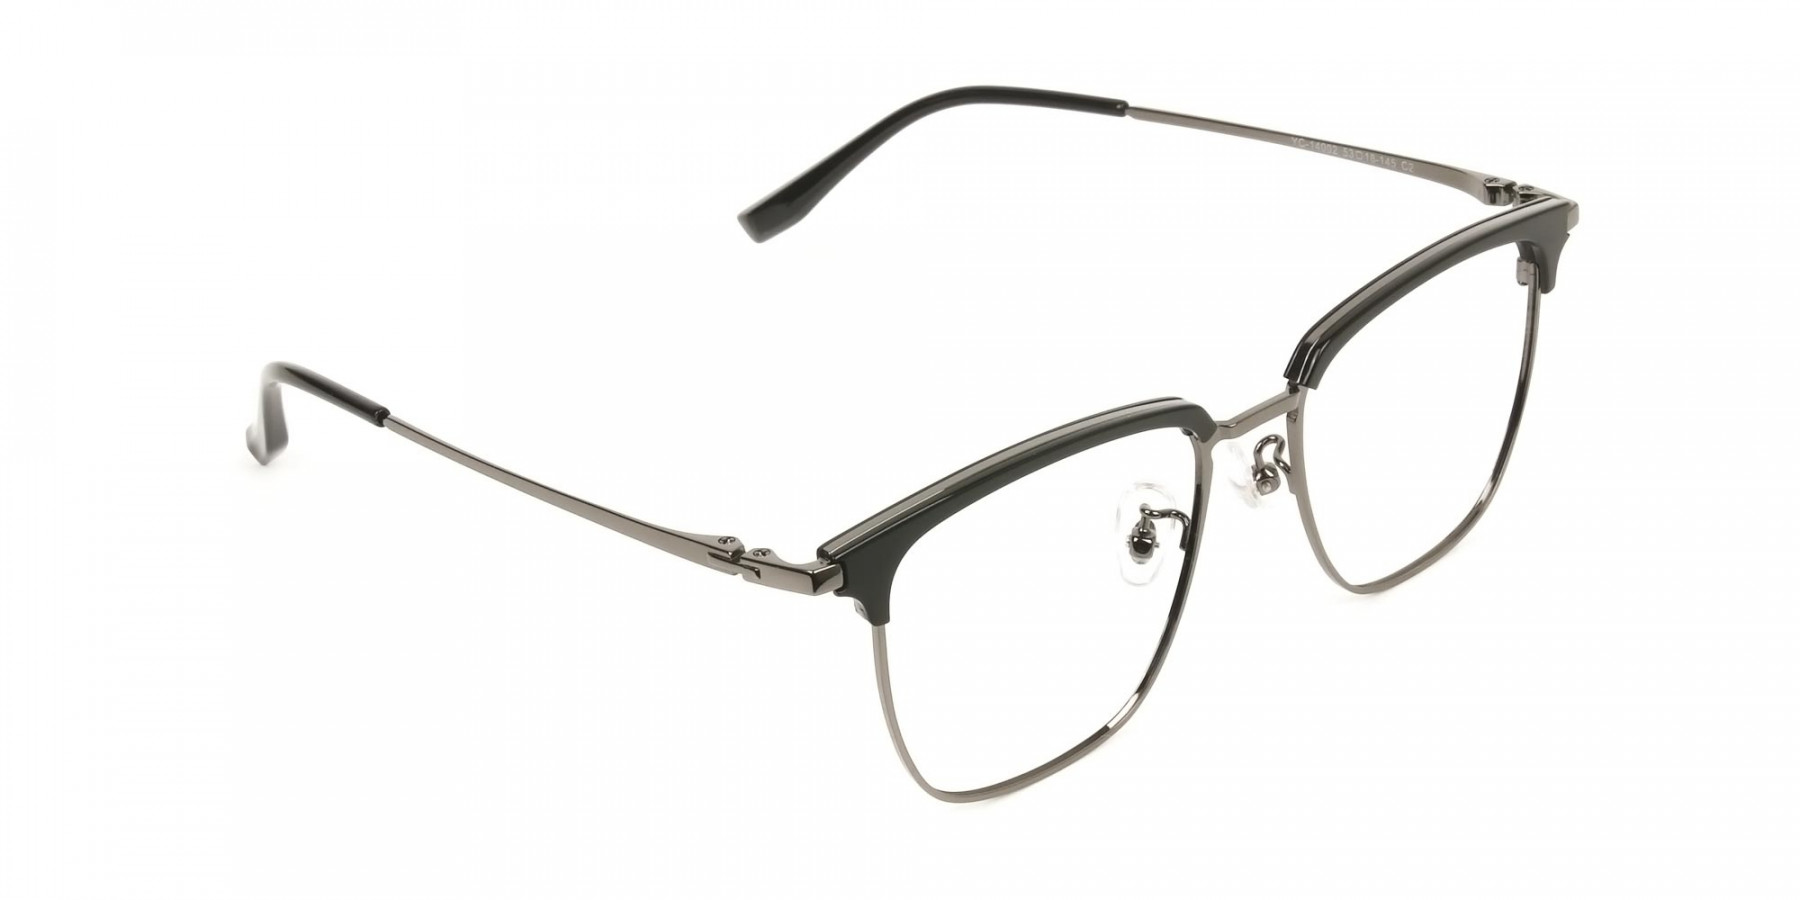 Wayfarer Black & Gunmetal Browline Glasses - 1